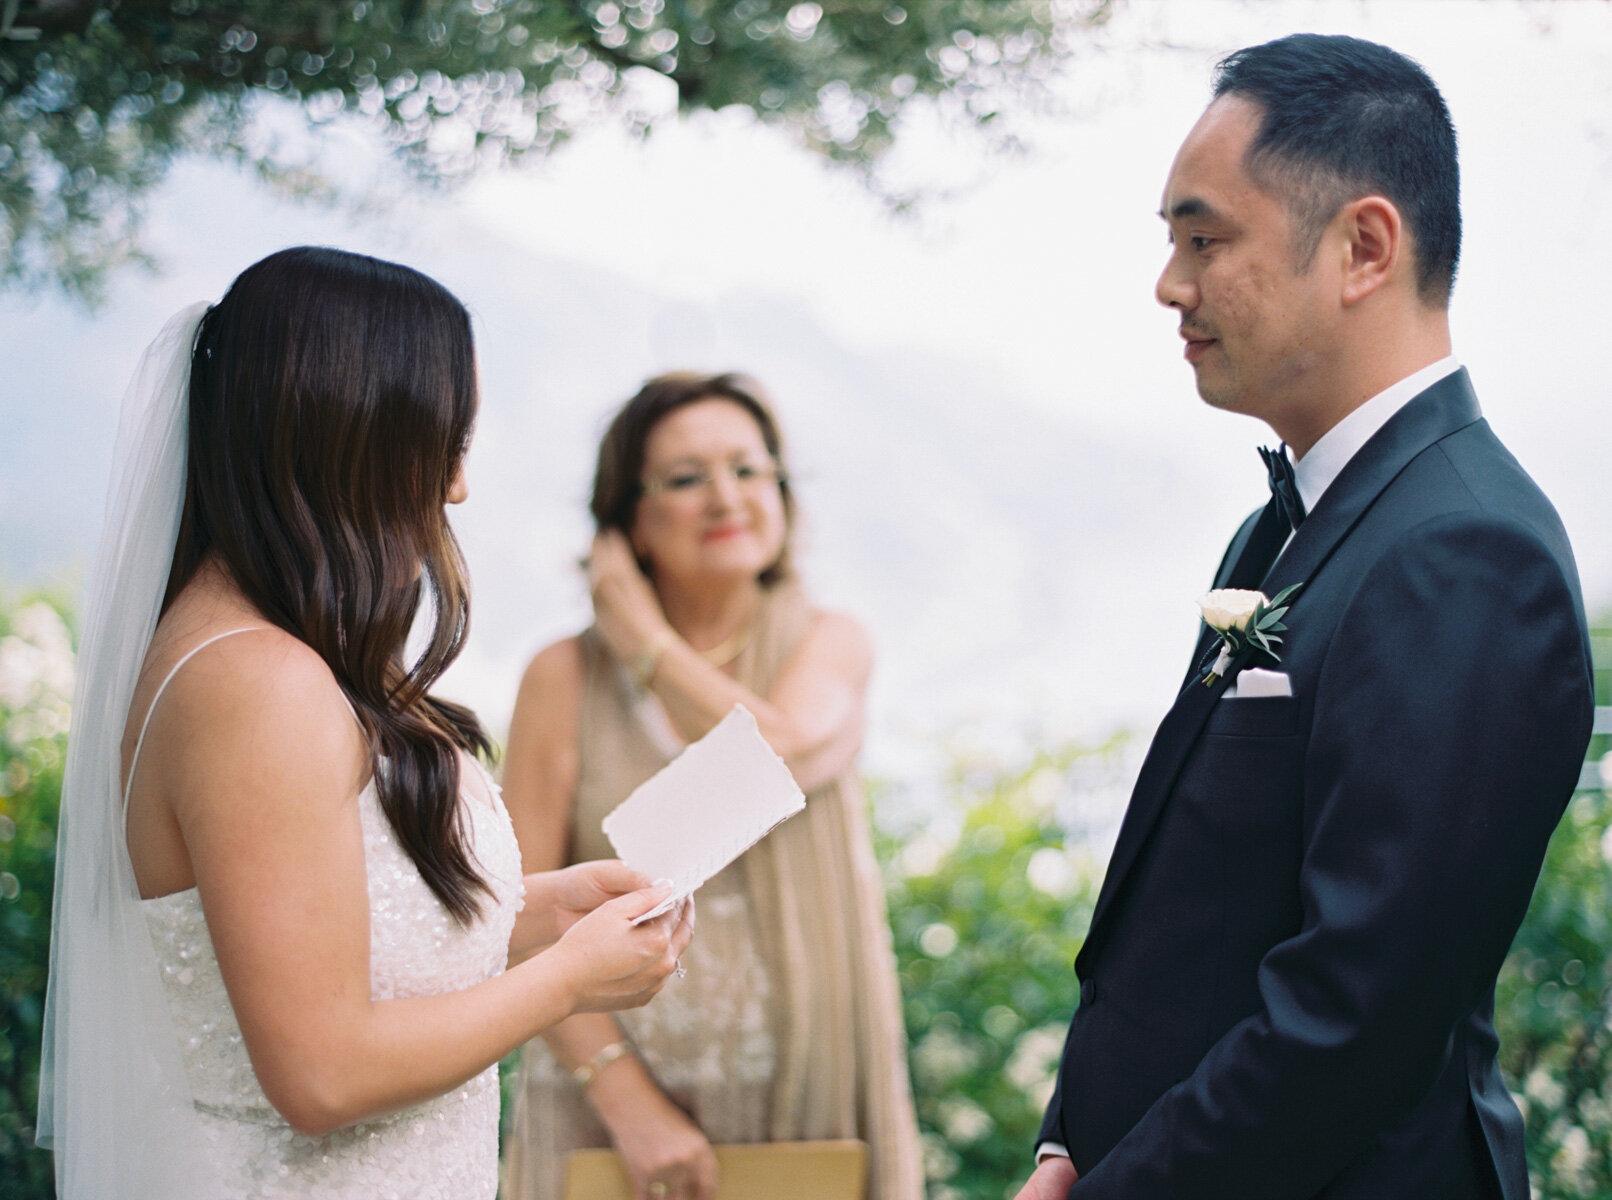 Belmond-Hotel-Caruso-ravello-elopement-Katie-Grant-destination-wedding (27 of 50).jpg